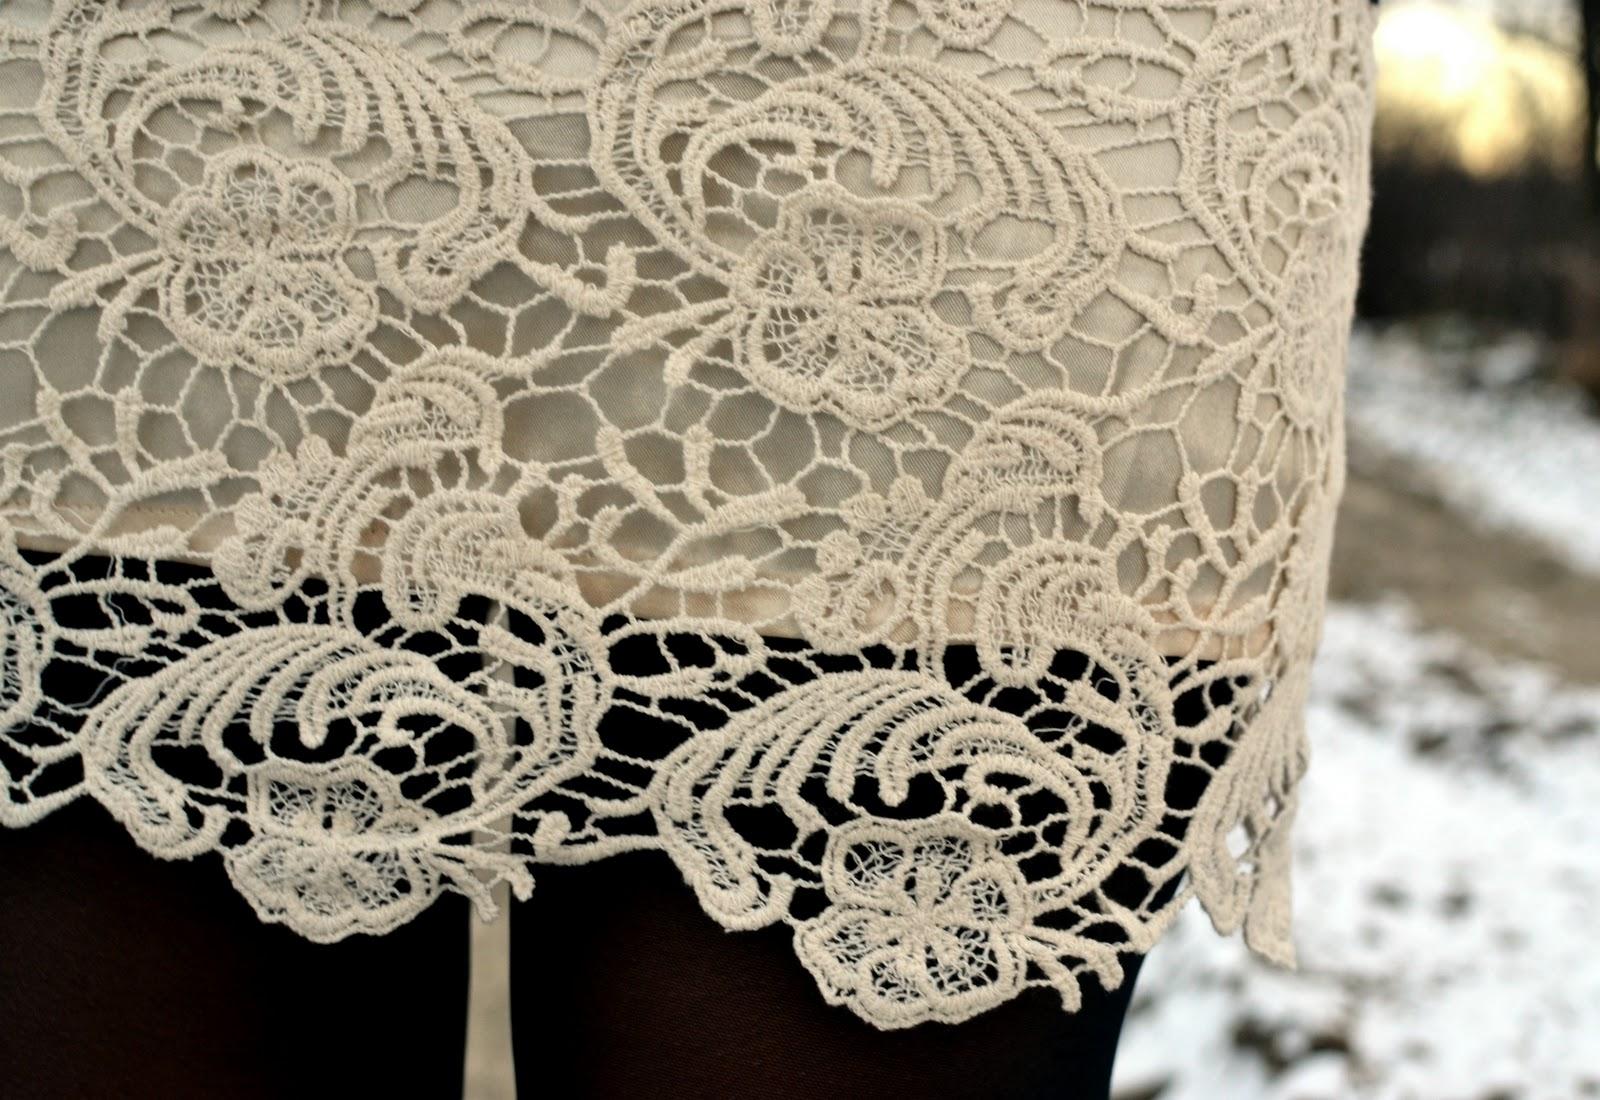 http://1.bp.blogspot.com/--ELKU0F8ZOI/TvE40tPxogI/AAAAAAAABV0/IJRveZHIQ34/s1600/winter+white+lace+skirt.jpg